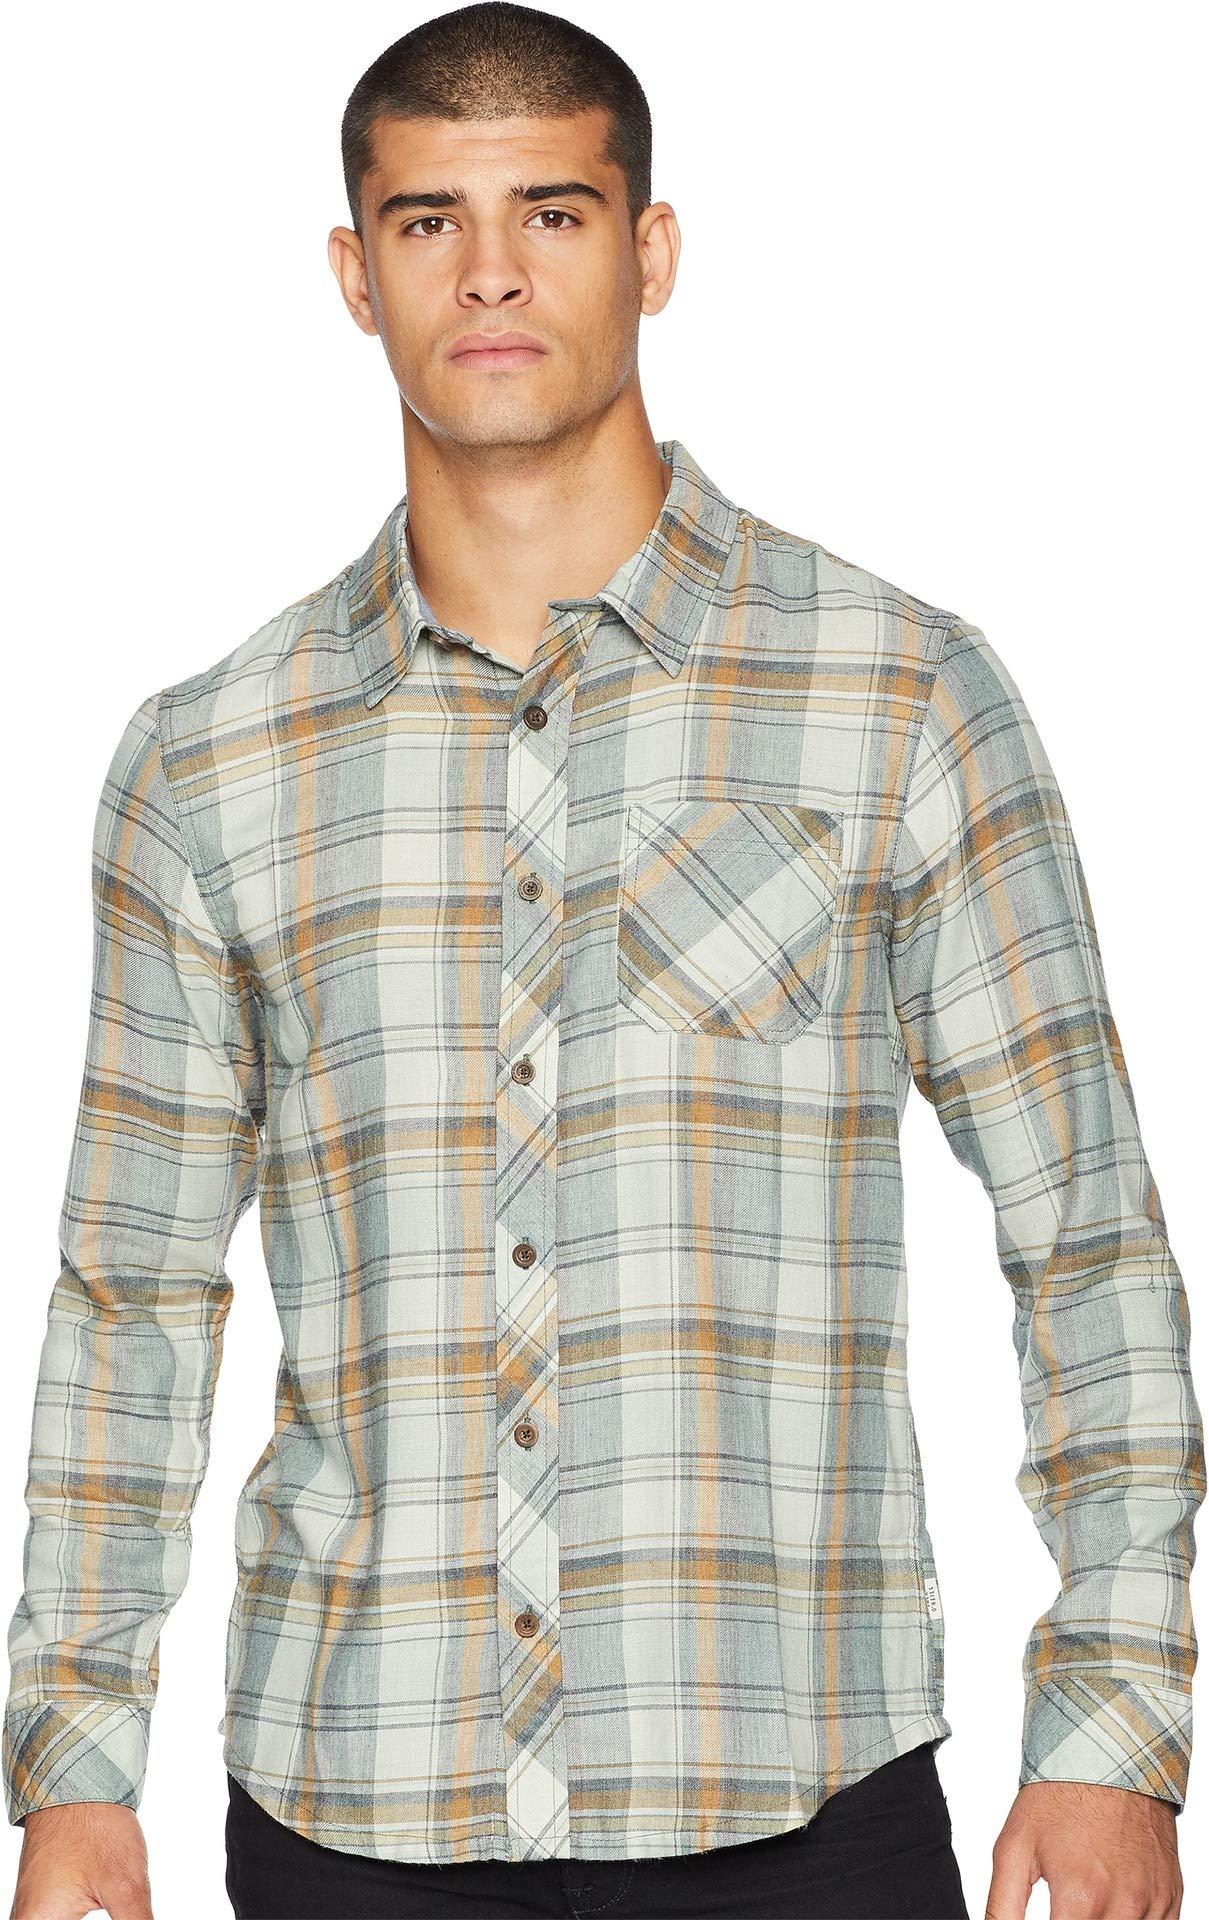 O'Neill Men's Jack Shelter Shirts,2X-Large,Dark Sea Glass